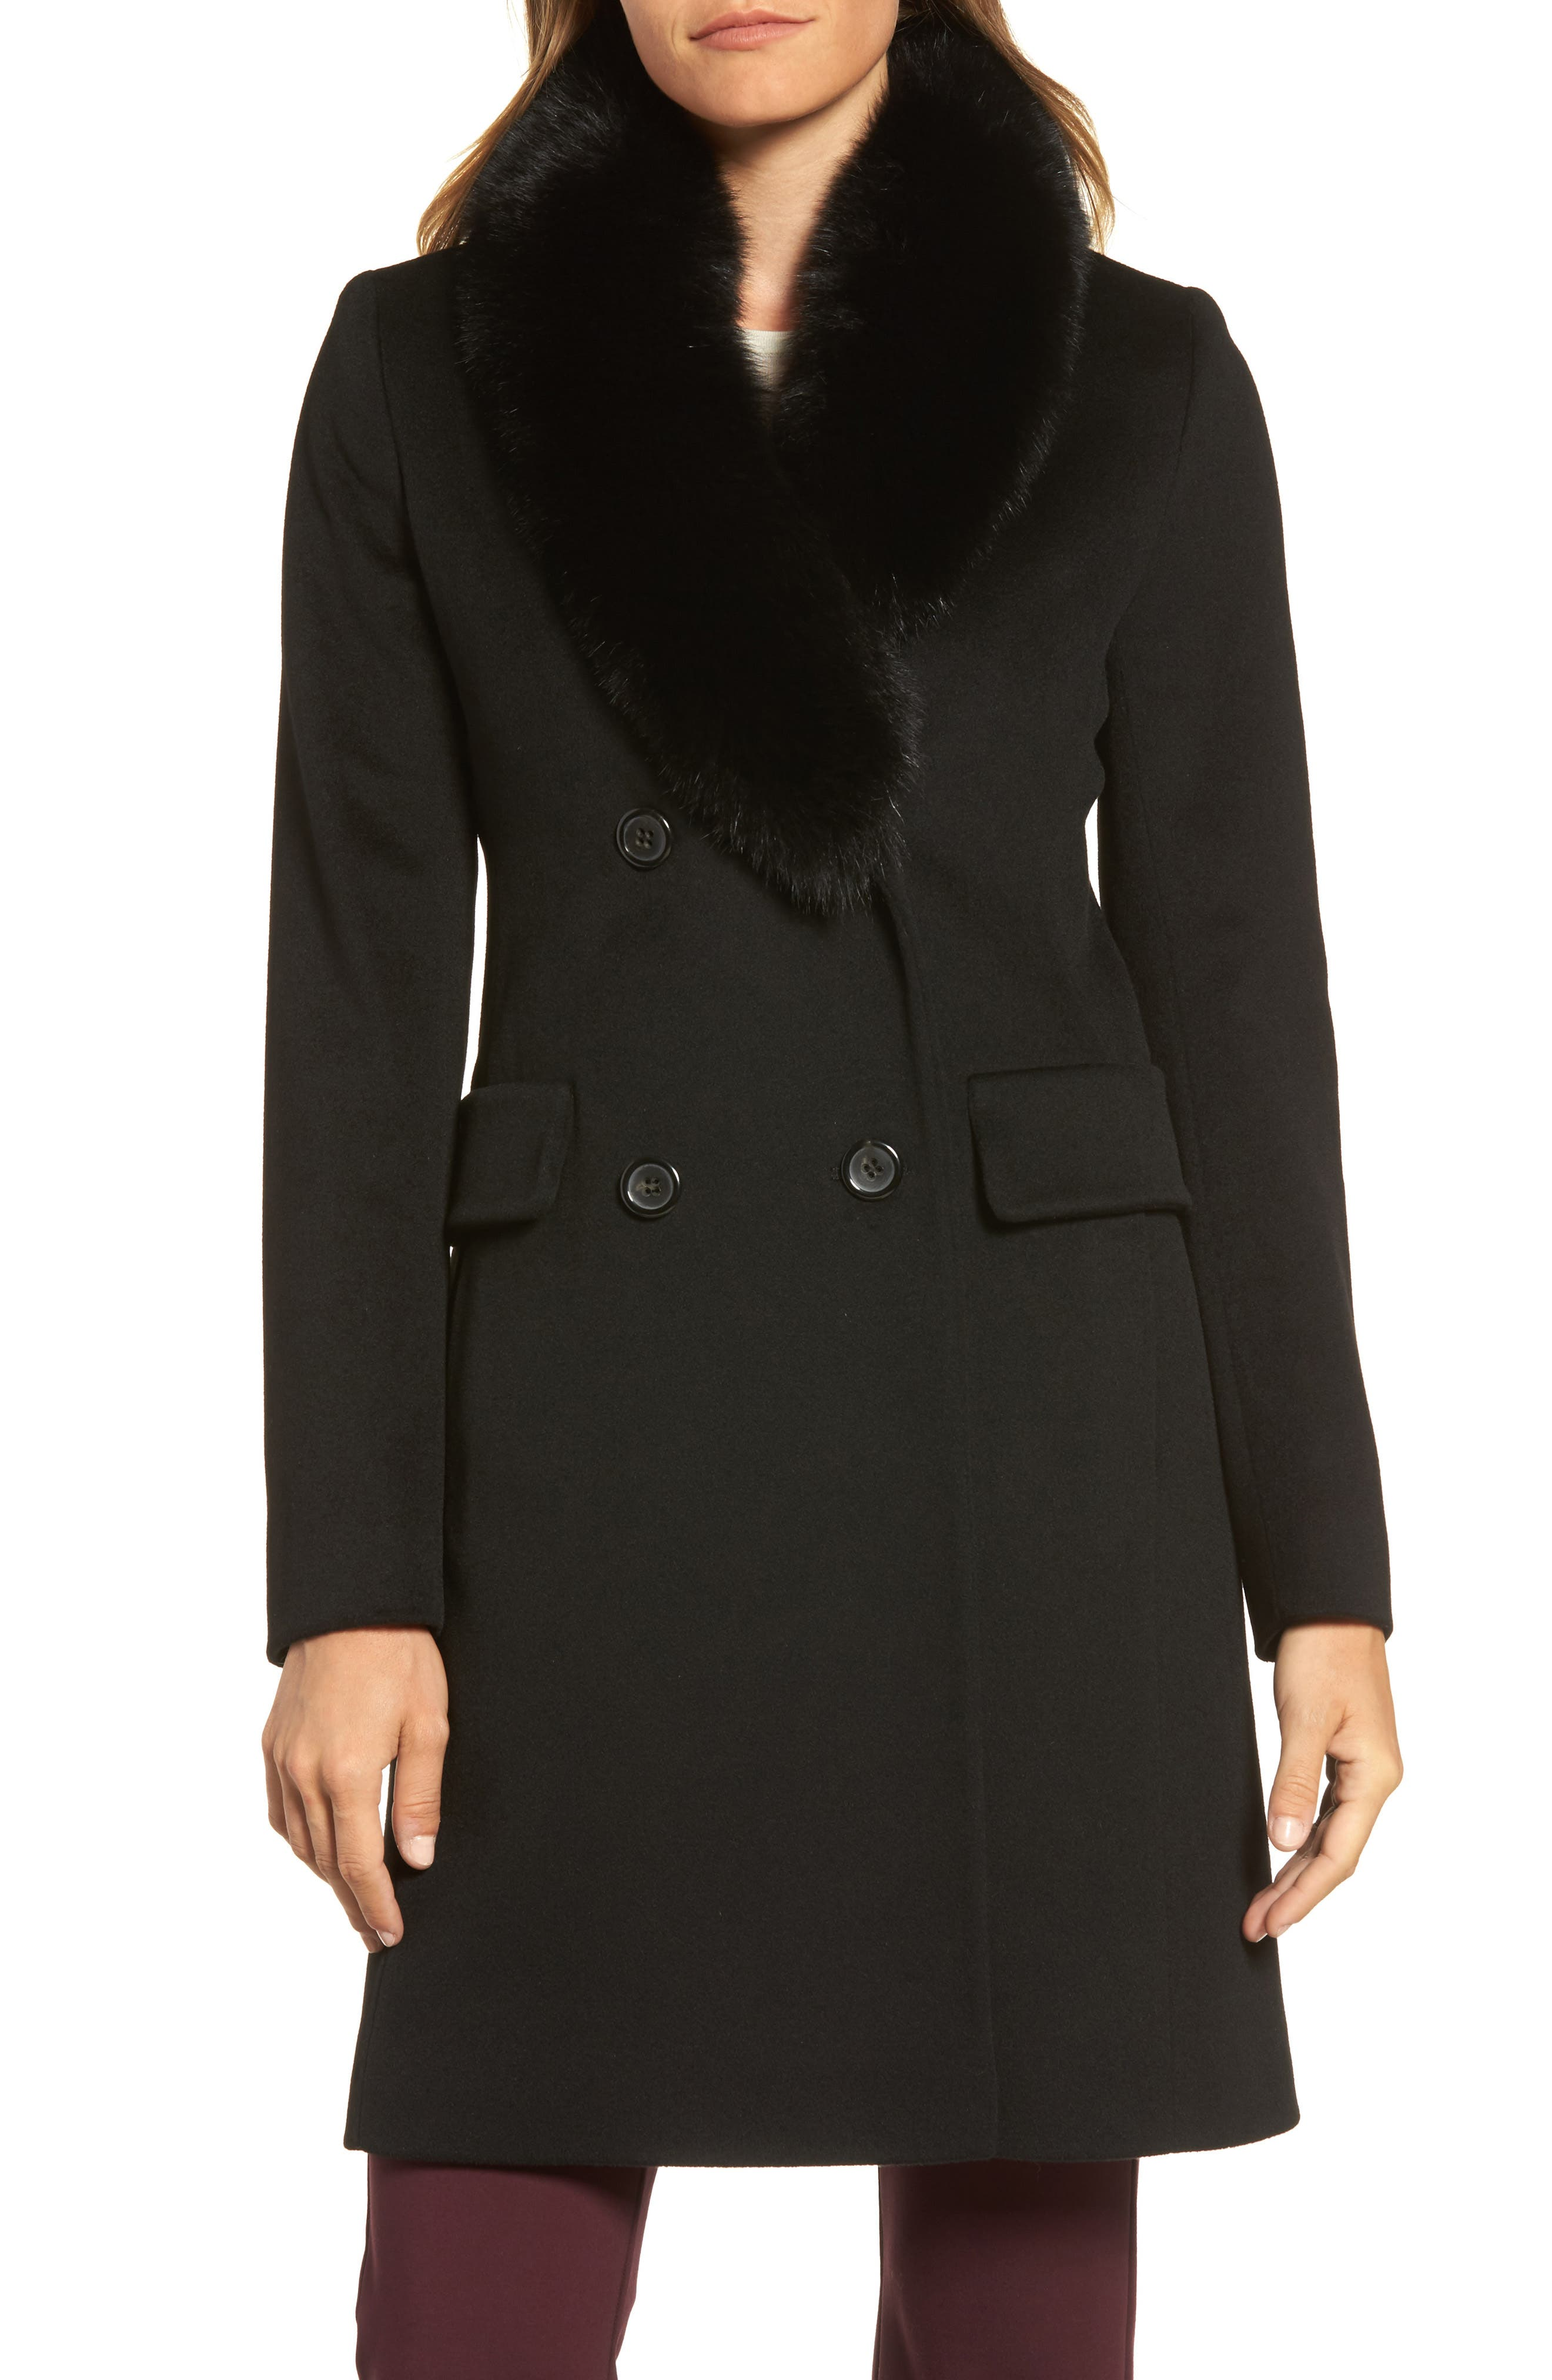 Alternate Image 1 Selected - Fleurette Loro Piana Wool Coat with Genuine Fox Fur Collar